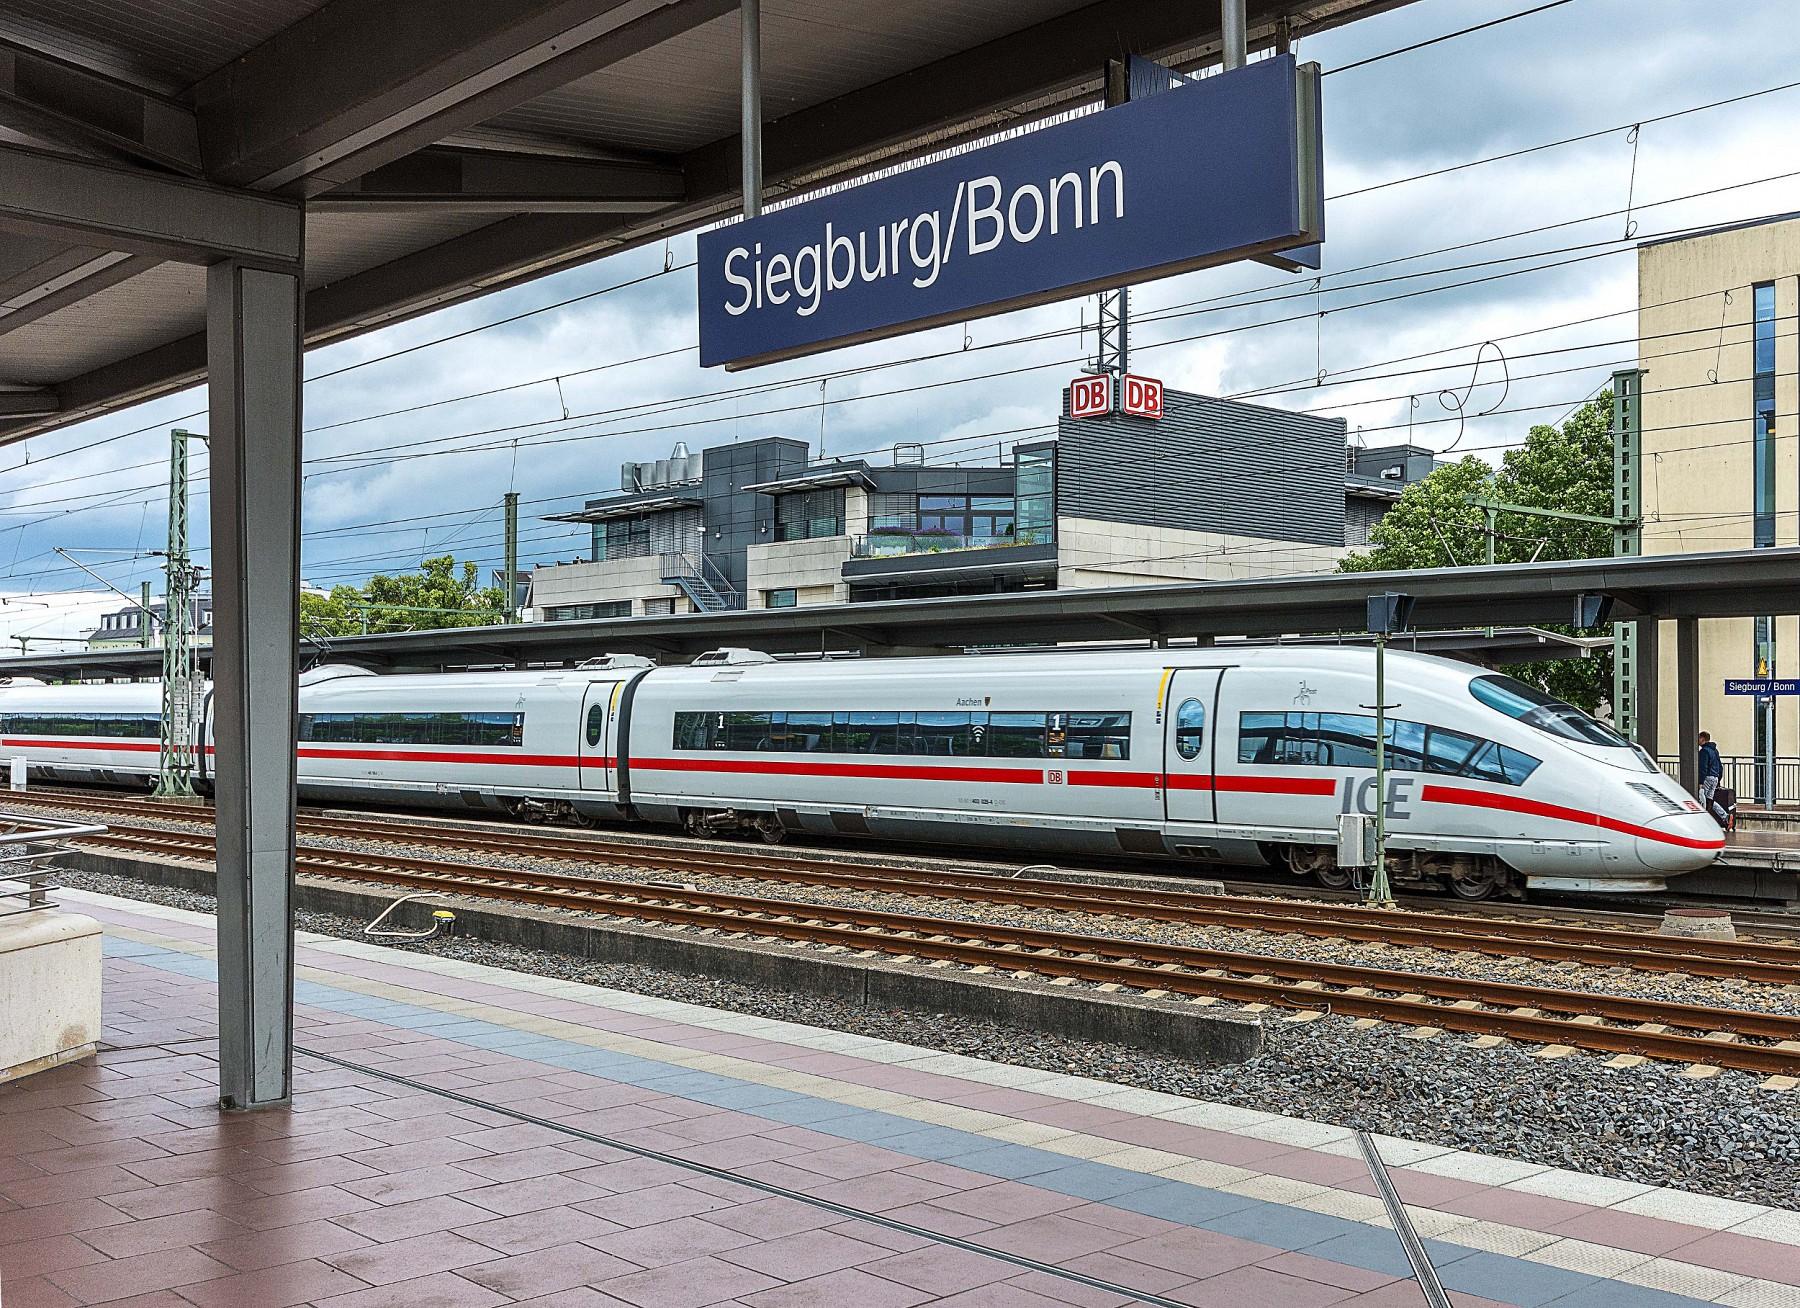 siegburg-hbf